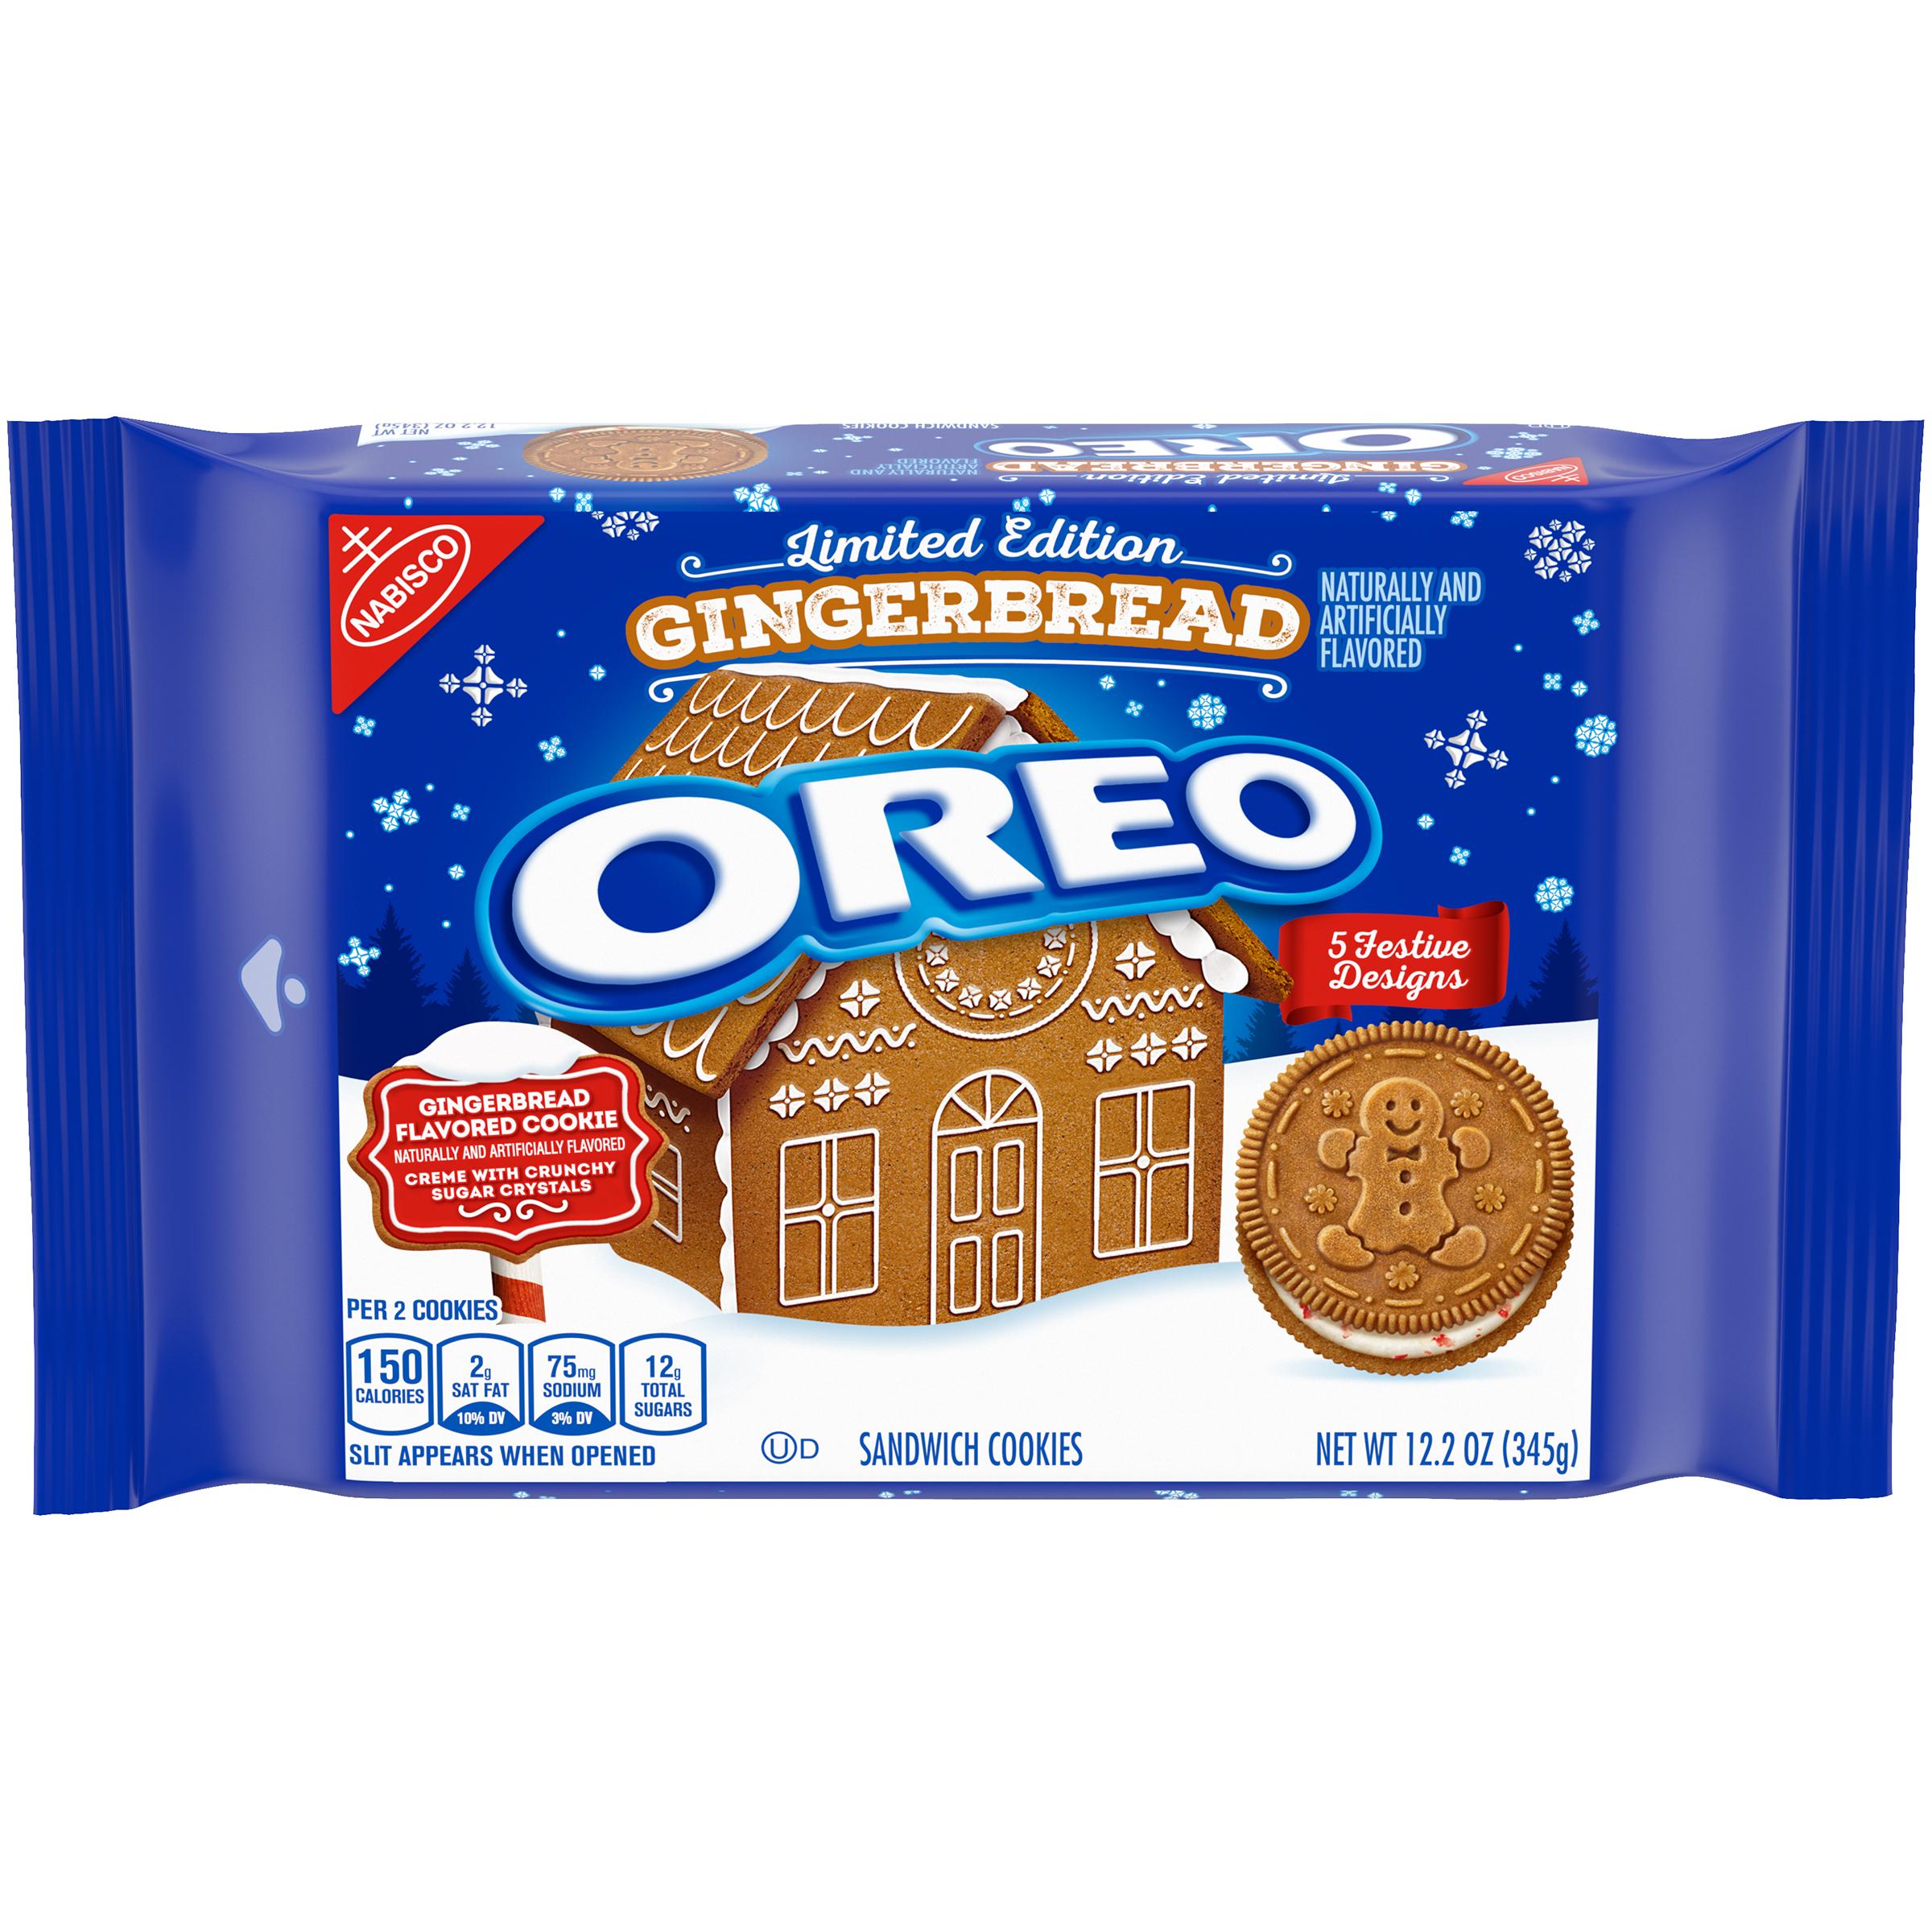 OREO Gingerbread Cookies 12.2 oz